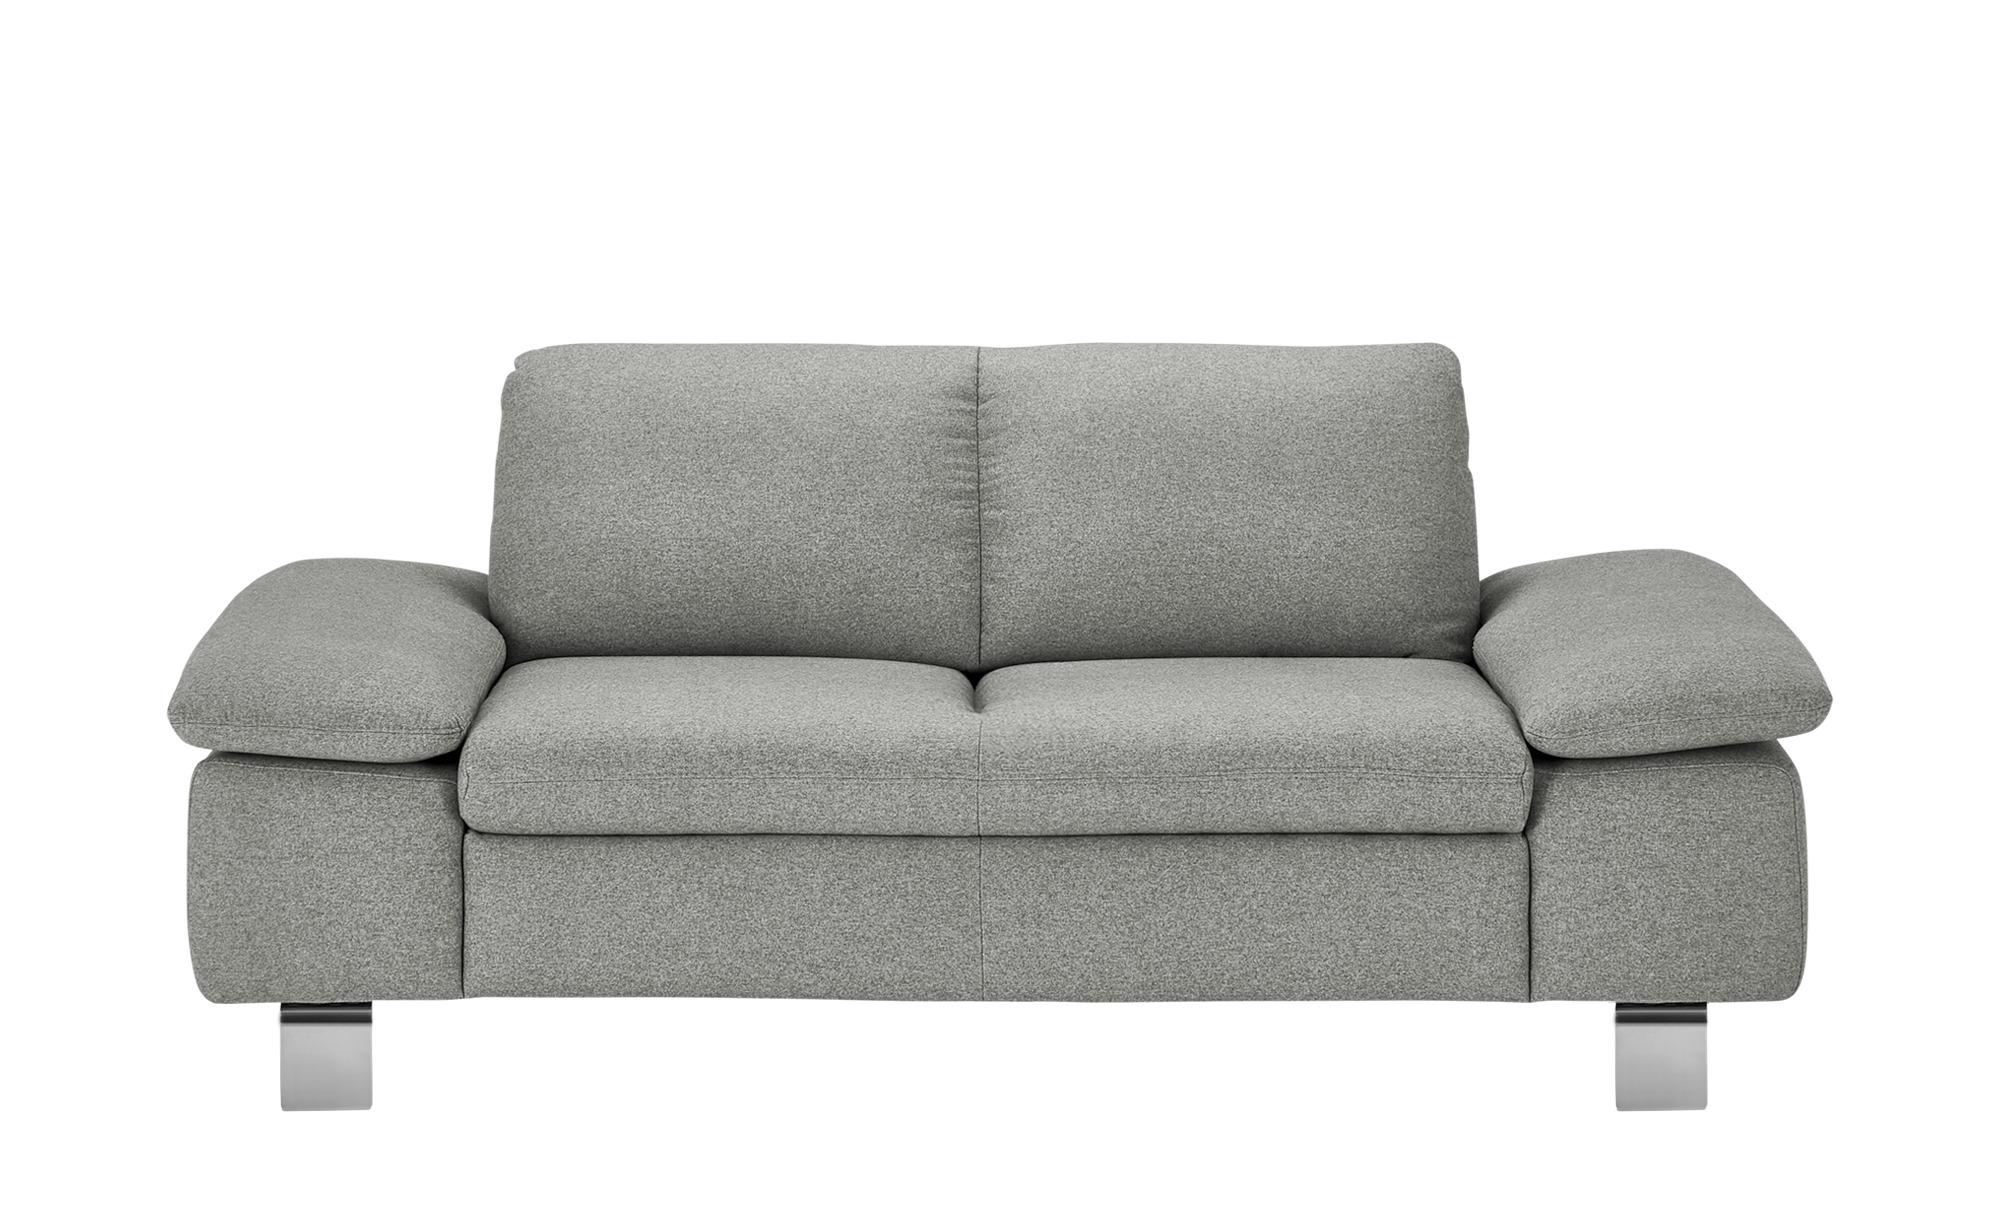 smart Sofa  Finola ¦ grau ¦ Maße (cm): B: 181 H: 83 T: 94 Polstermöbel > Sofas > 2-Sitzer - Höffner